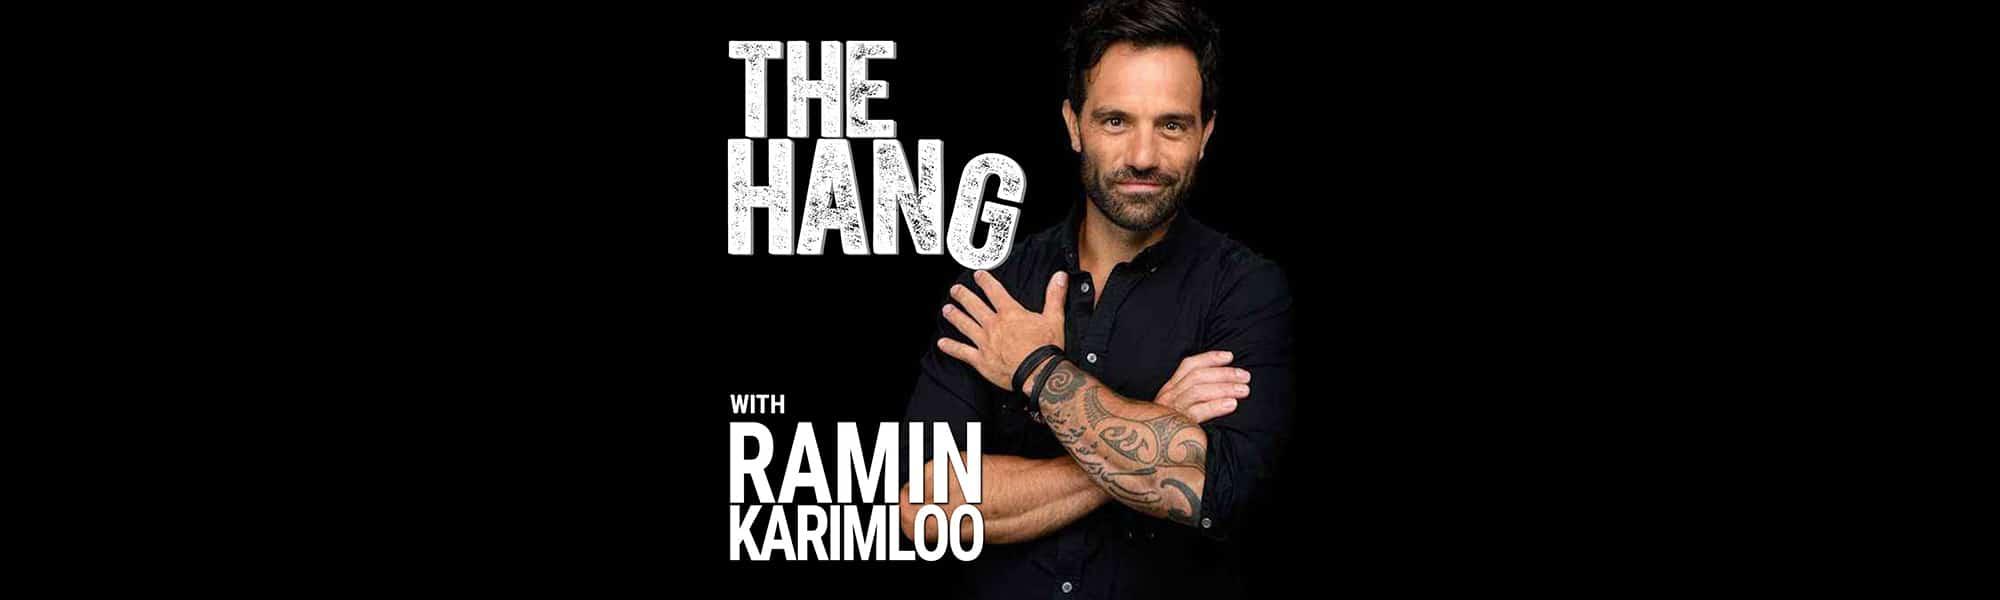 The Hang with Ramin Karimloo banner